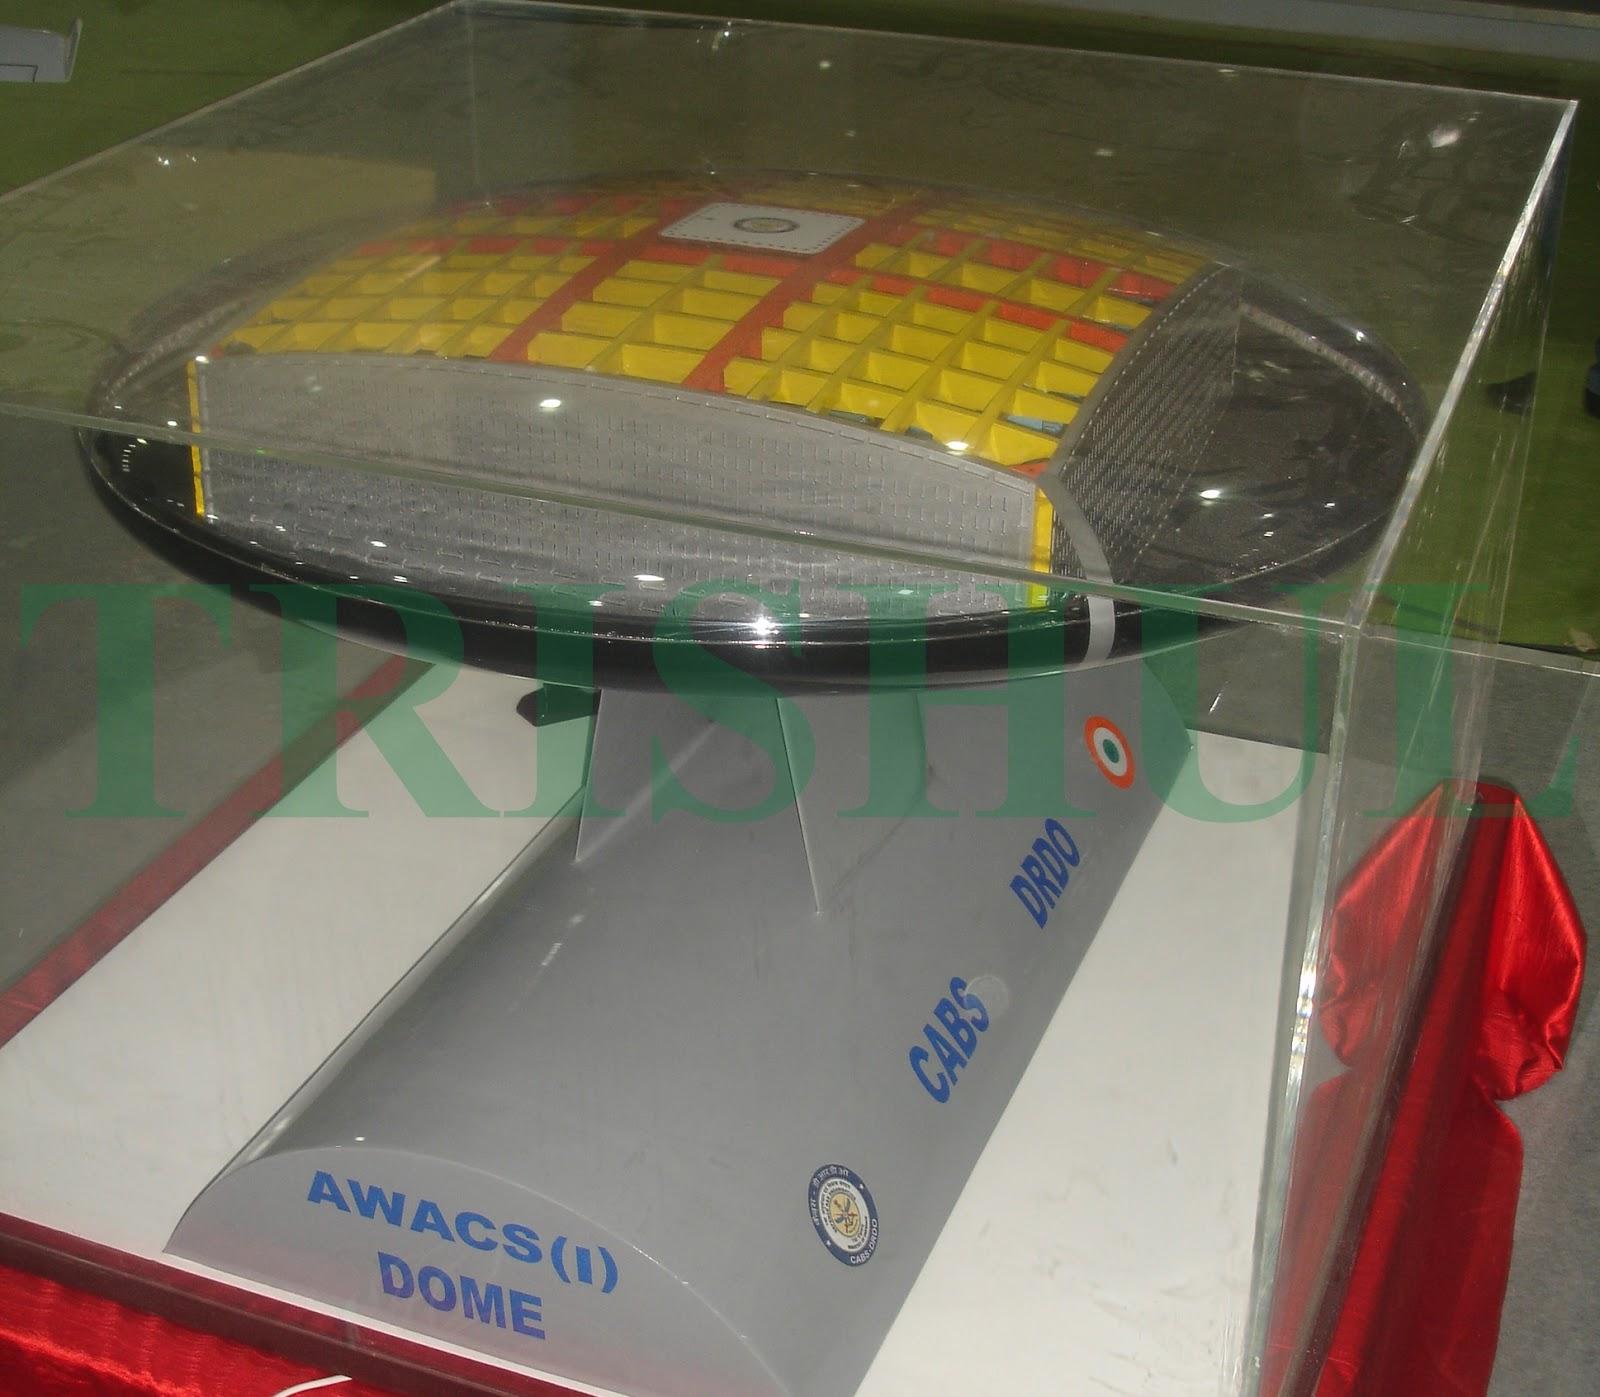 Desi AEW & CS Dome for $-array Antenna.jpg